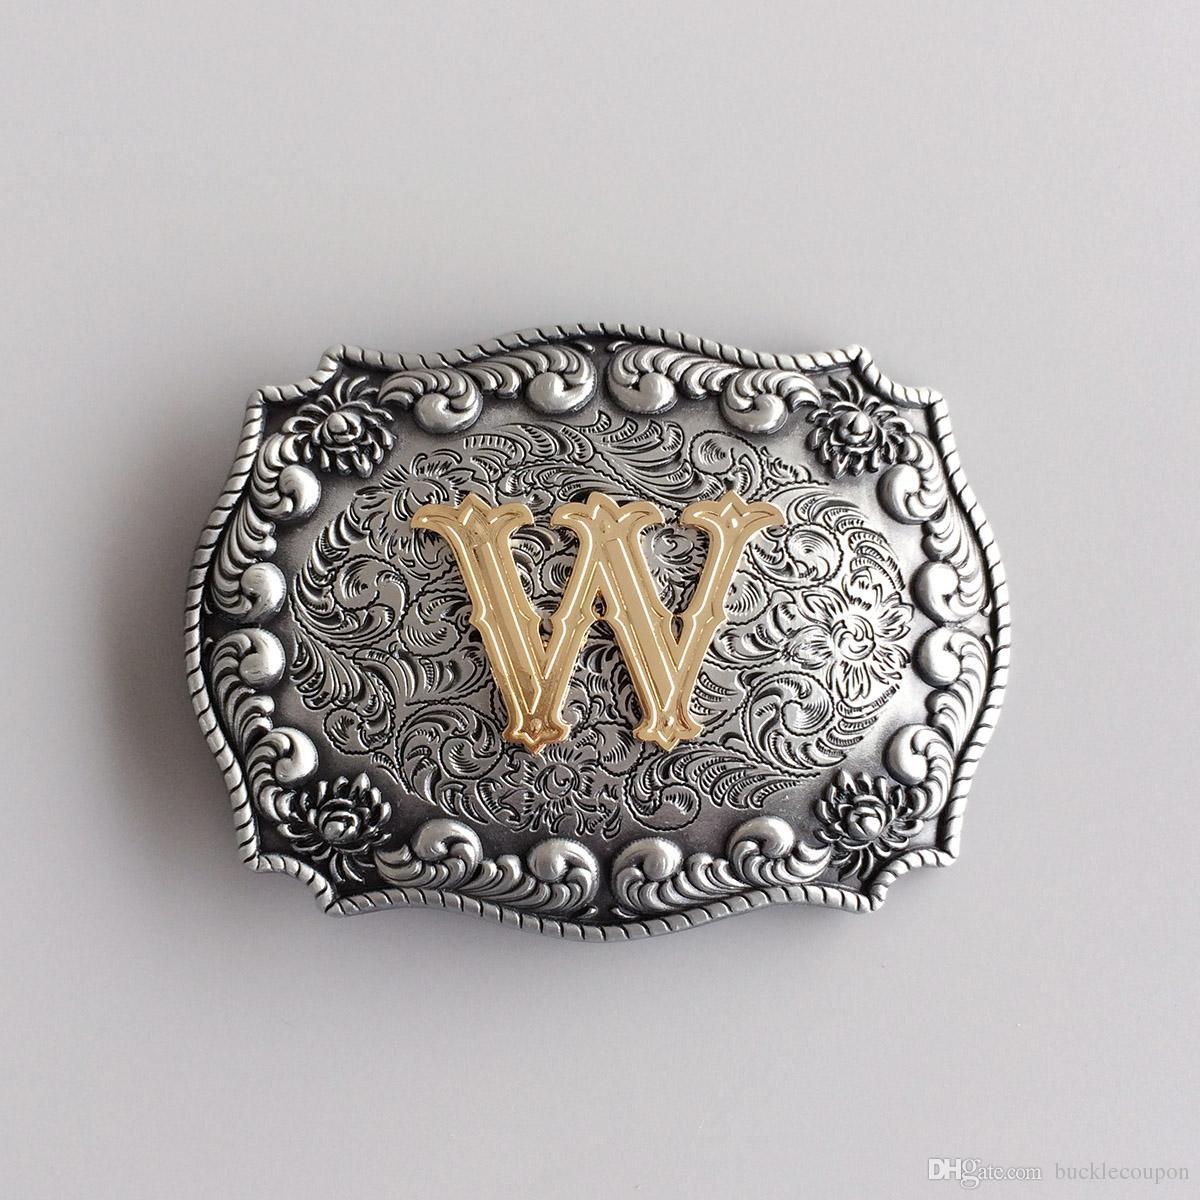 Anfangsbuchstaben M R S T W Western Rodeo Cowboy Big Size Gürtelschnalle Gurtelschnalle Boucle de ceinture SCHNALLE-LE010 Brand New